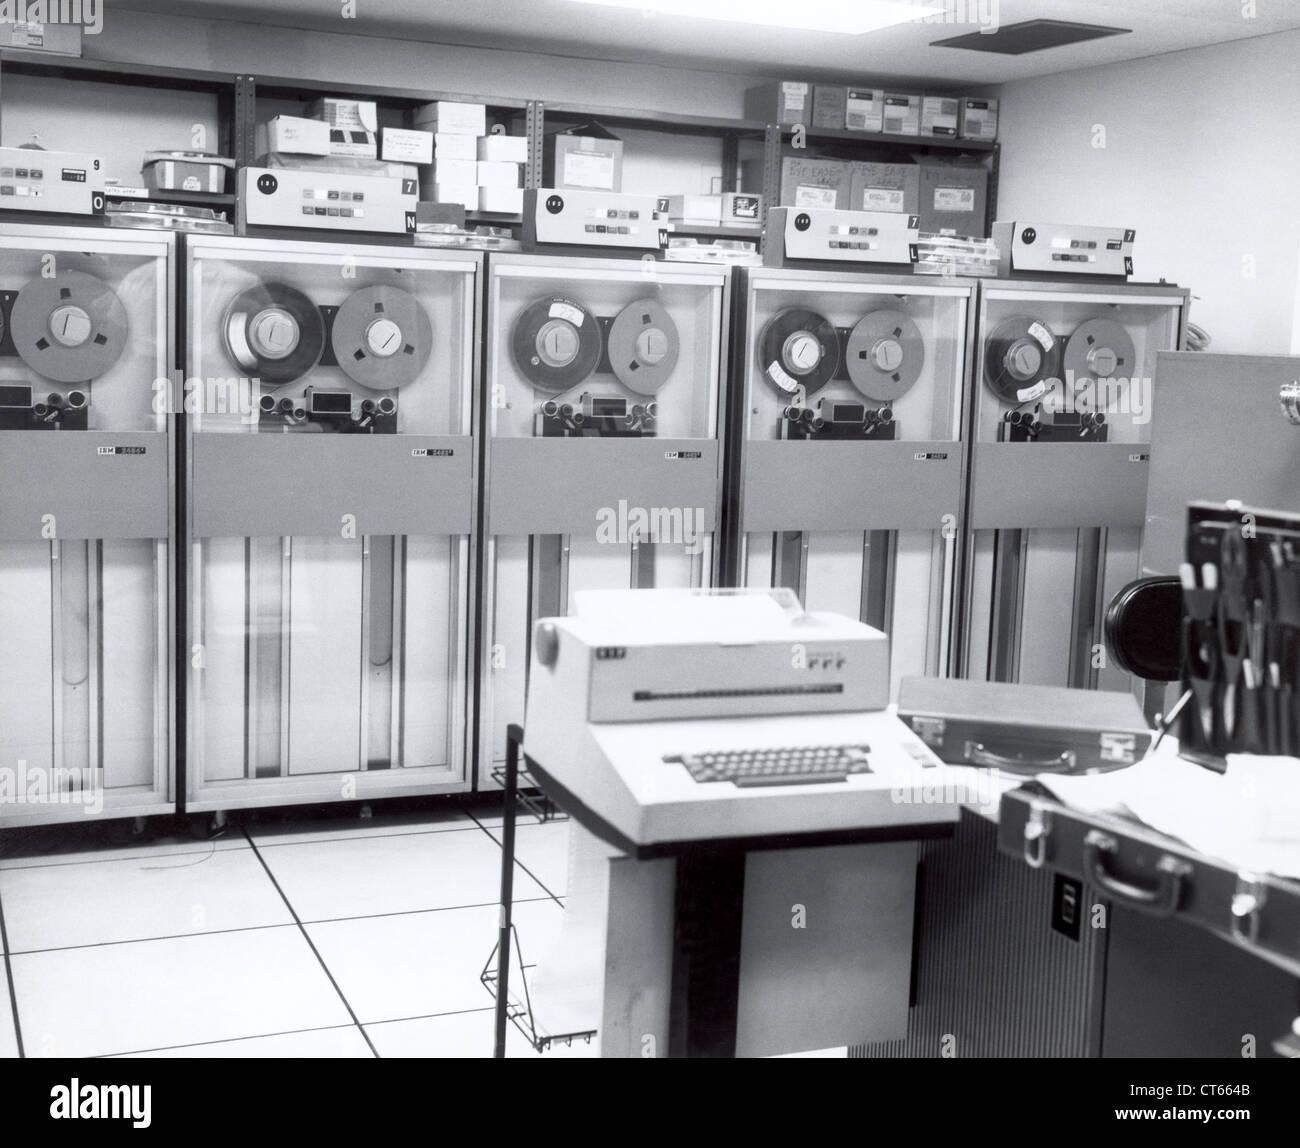 Printer and server room - Stock Image